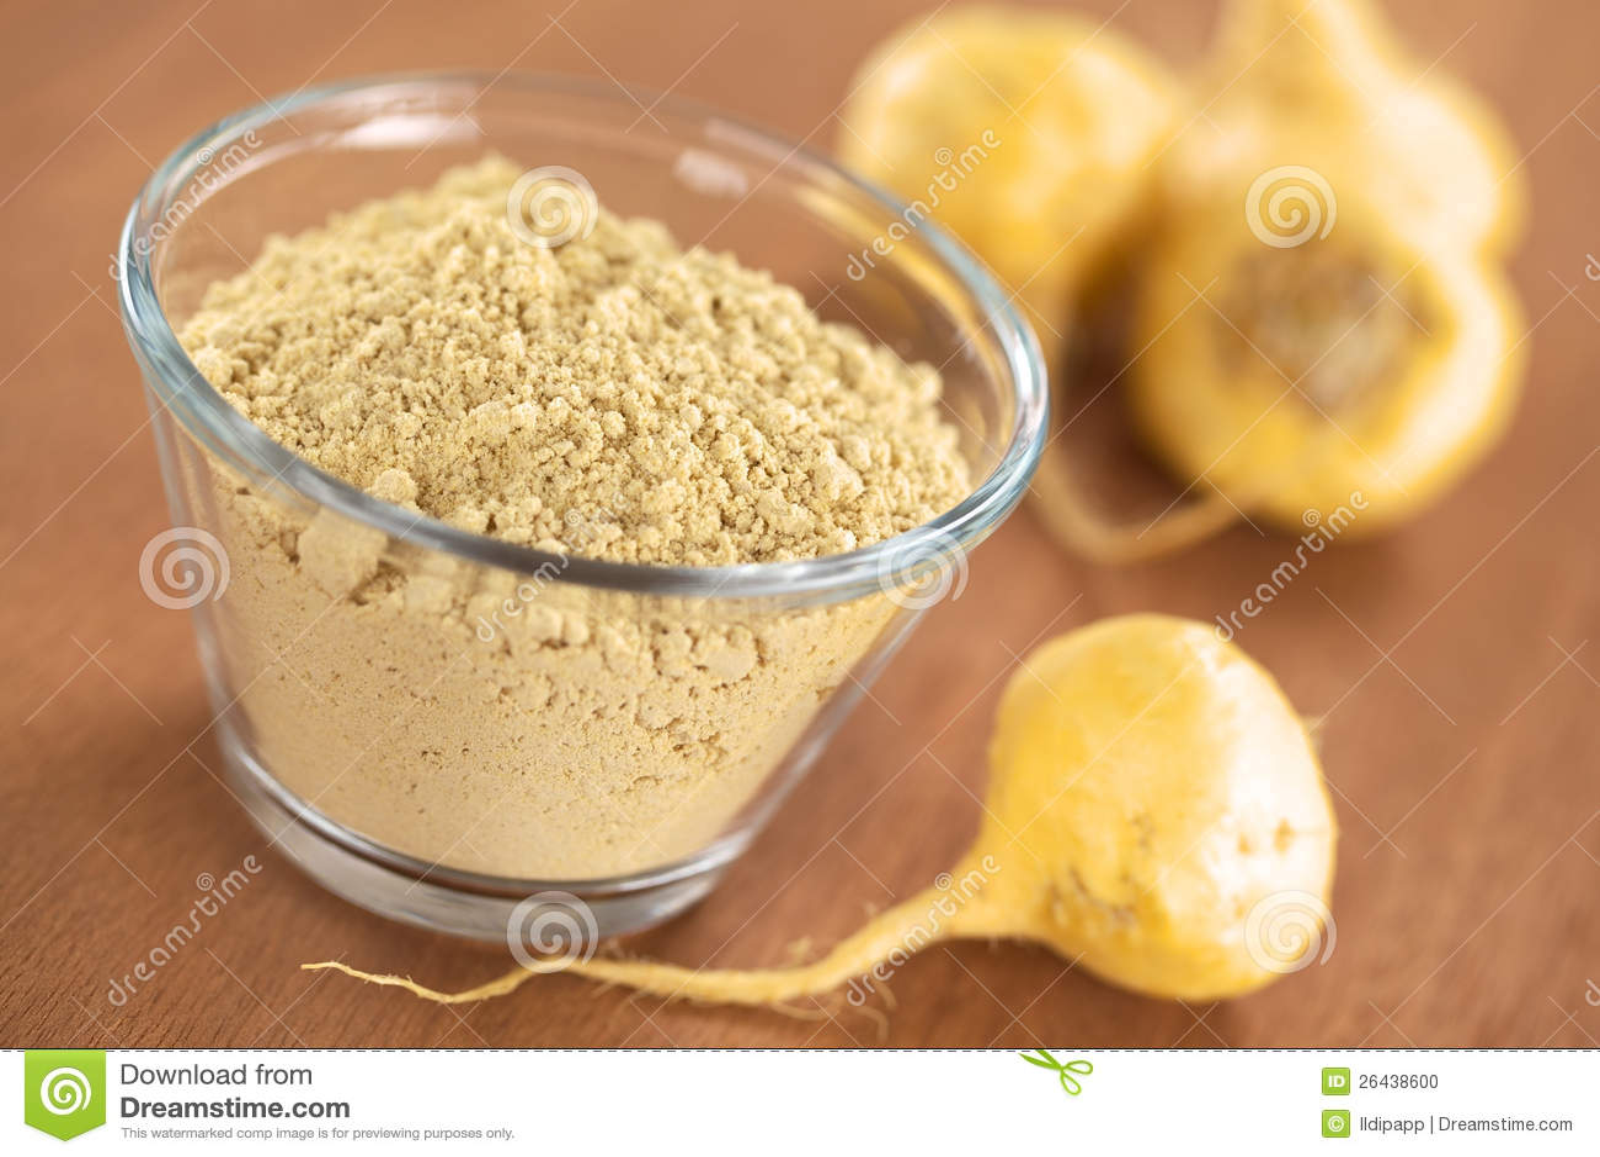 Maca Powder and Maca Root